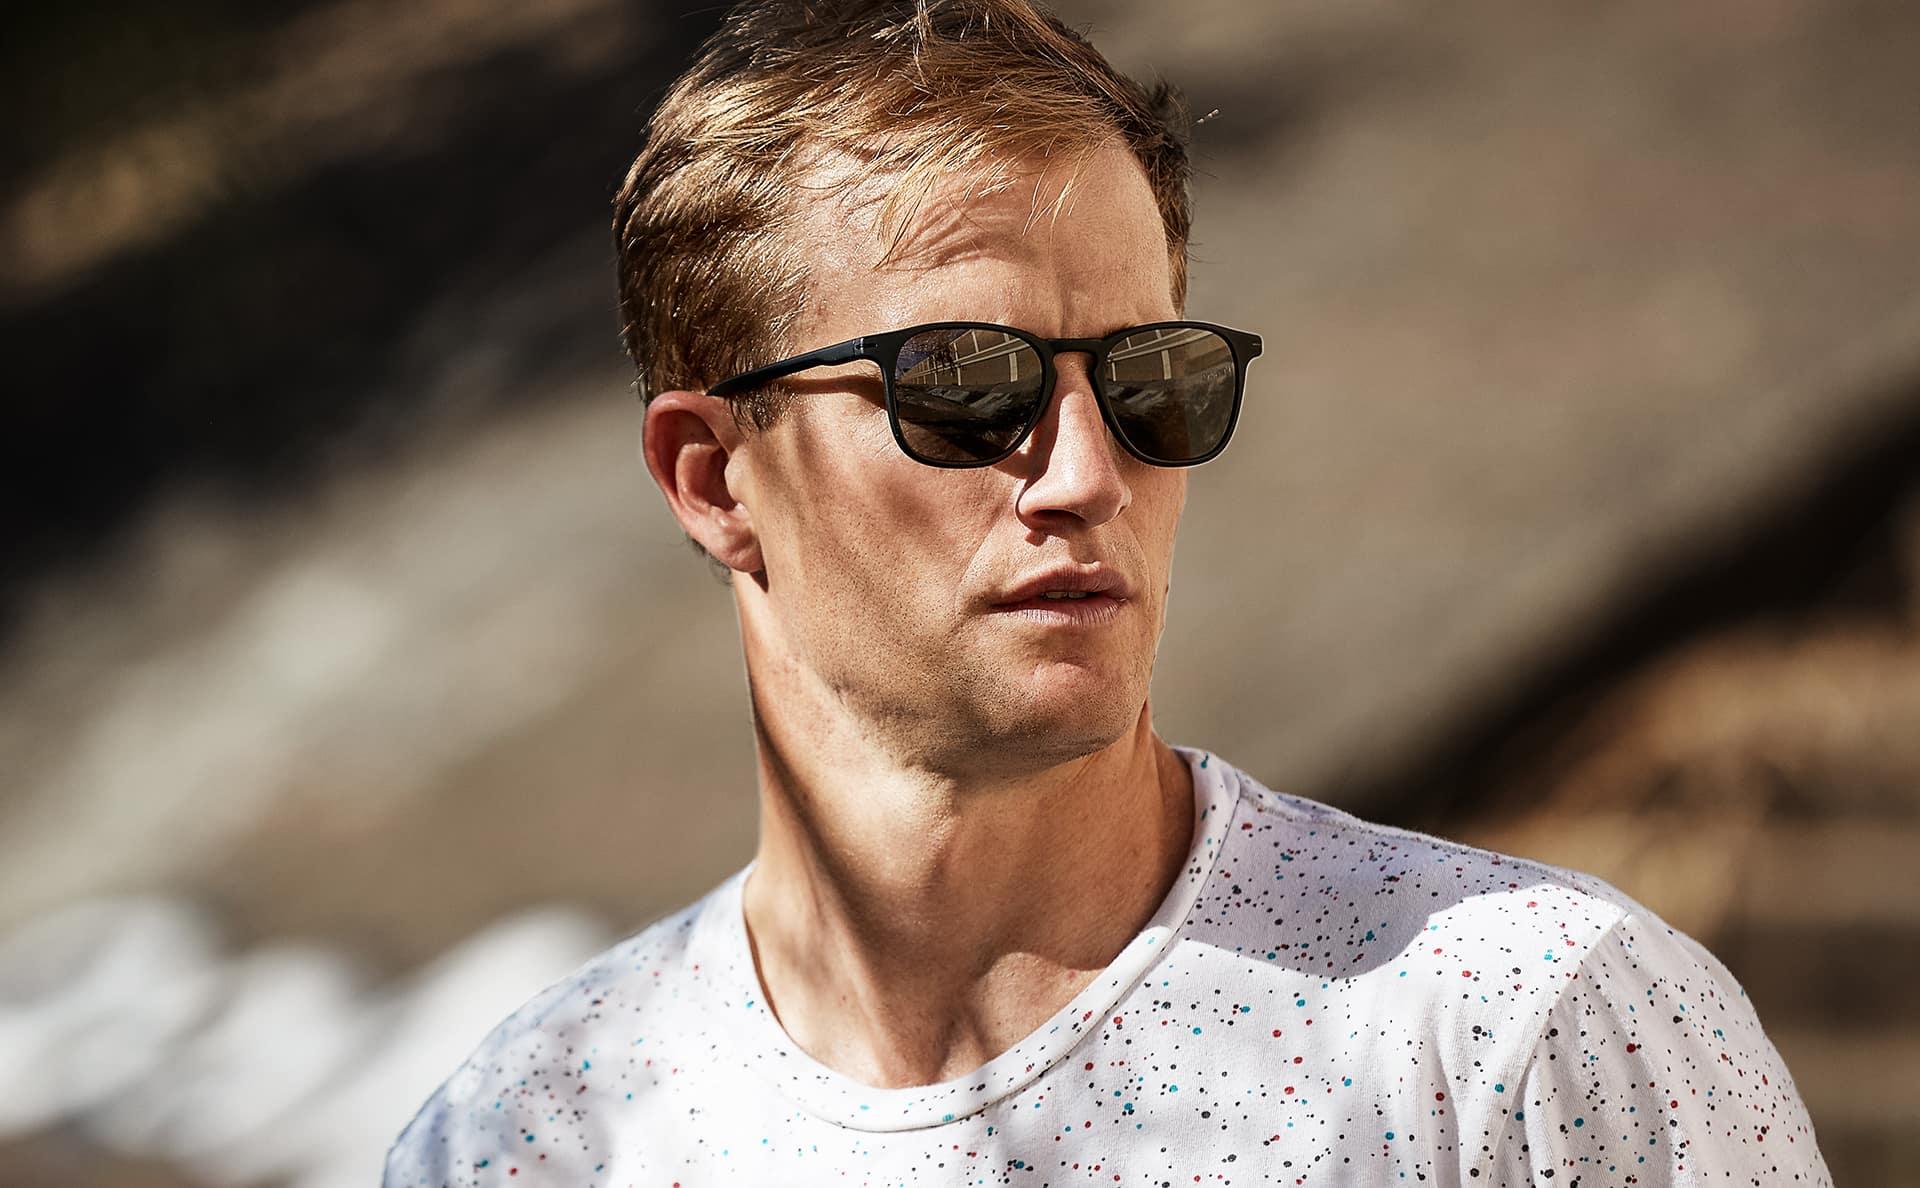 BMX cyclist Chris Tolley wearing Hunter matte black prescription sunglasses.